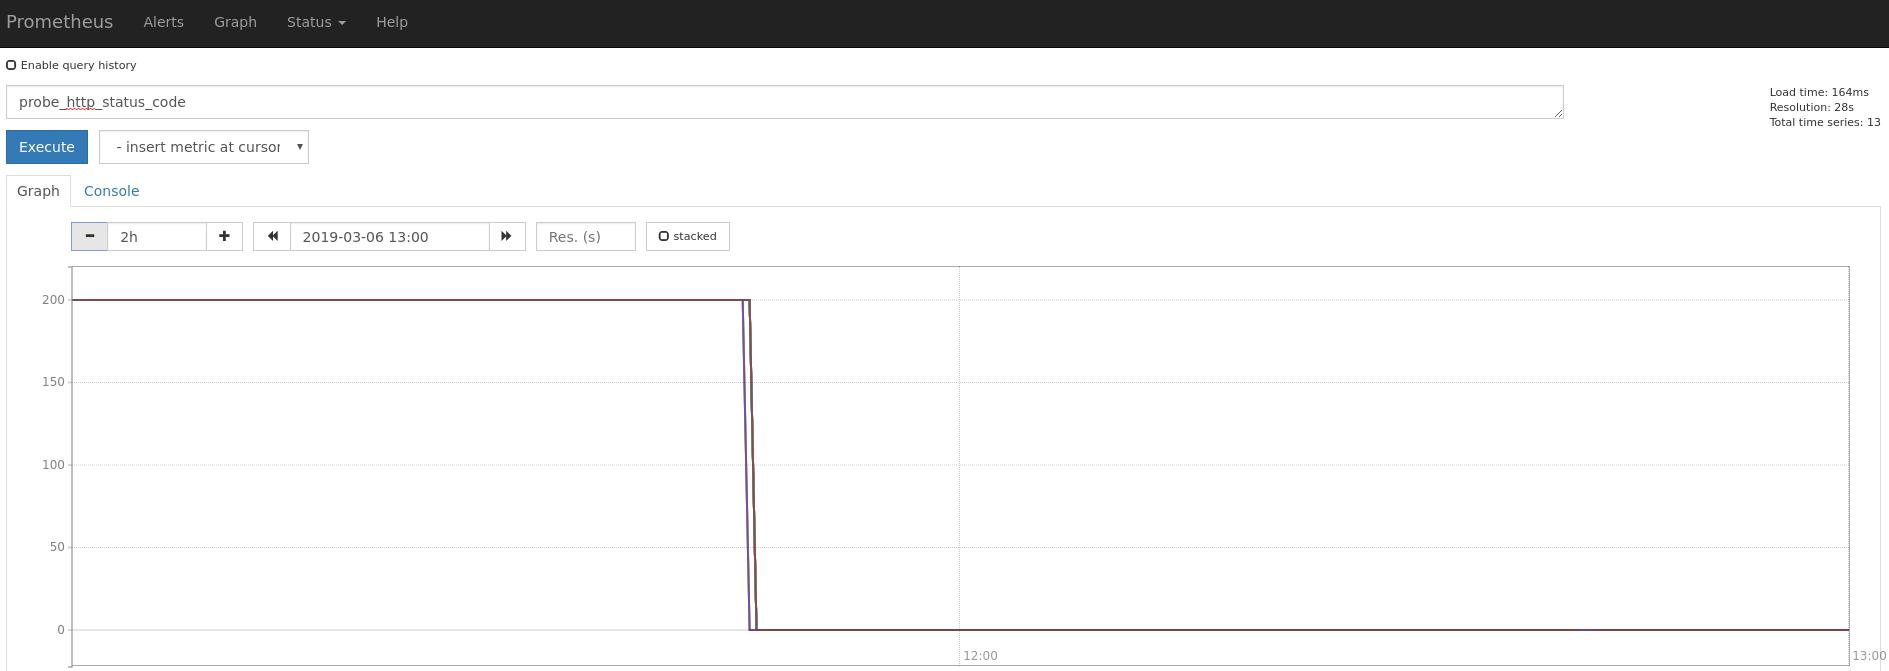 Prometheus: blackbox-exporter probe_http_status_code == 0 and its debug